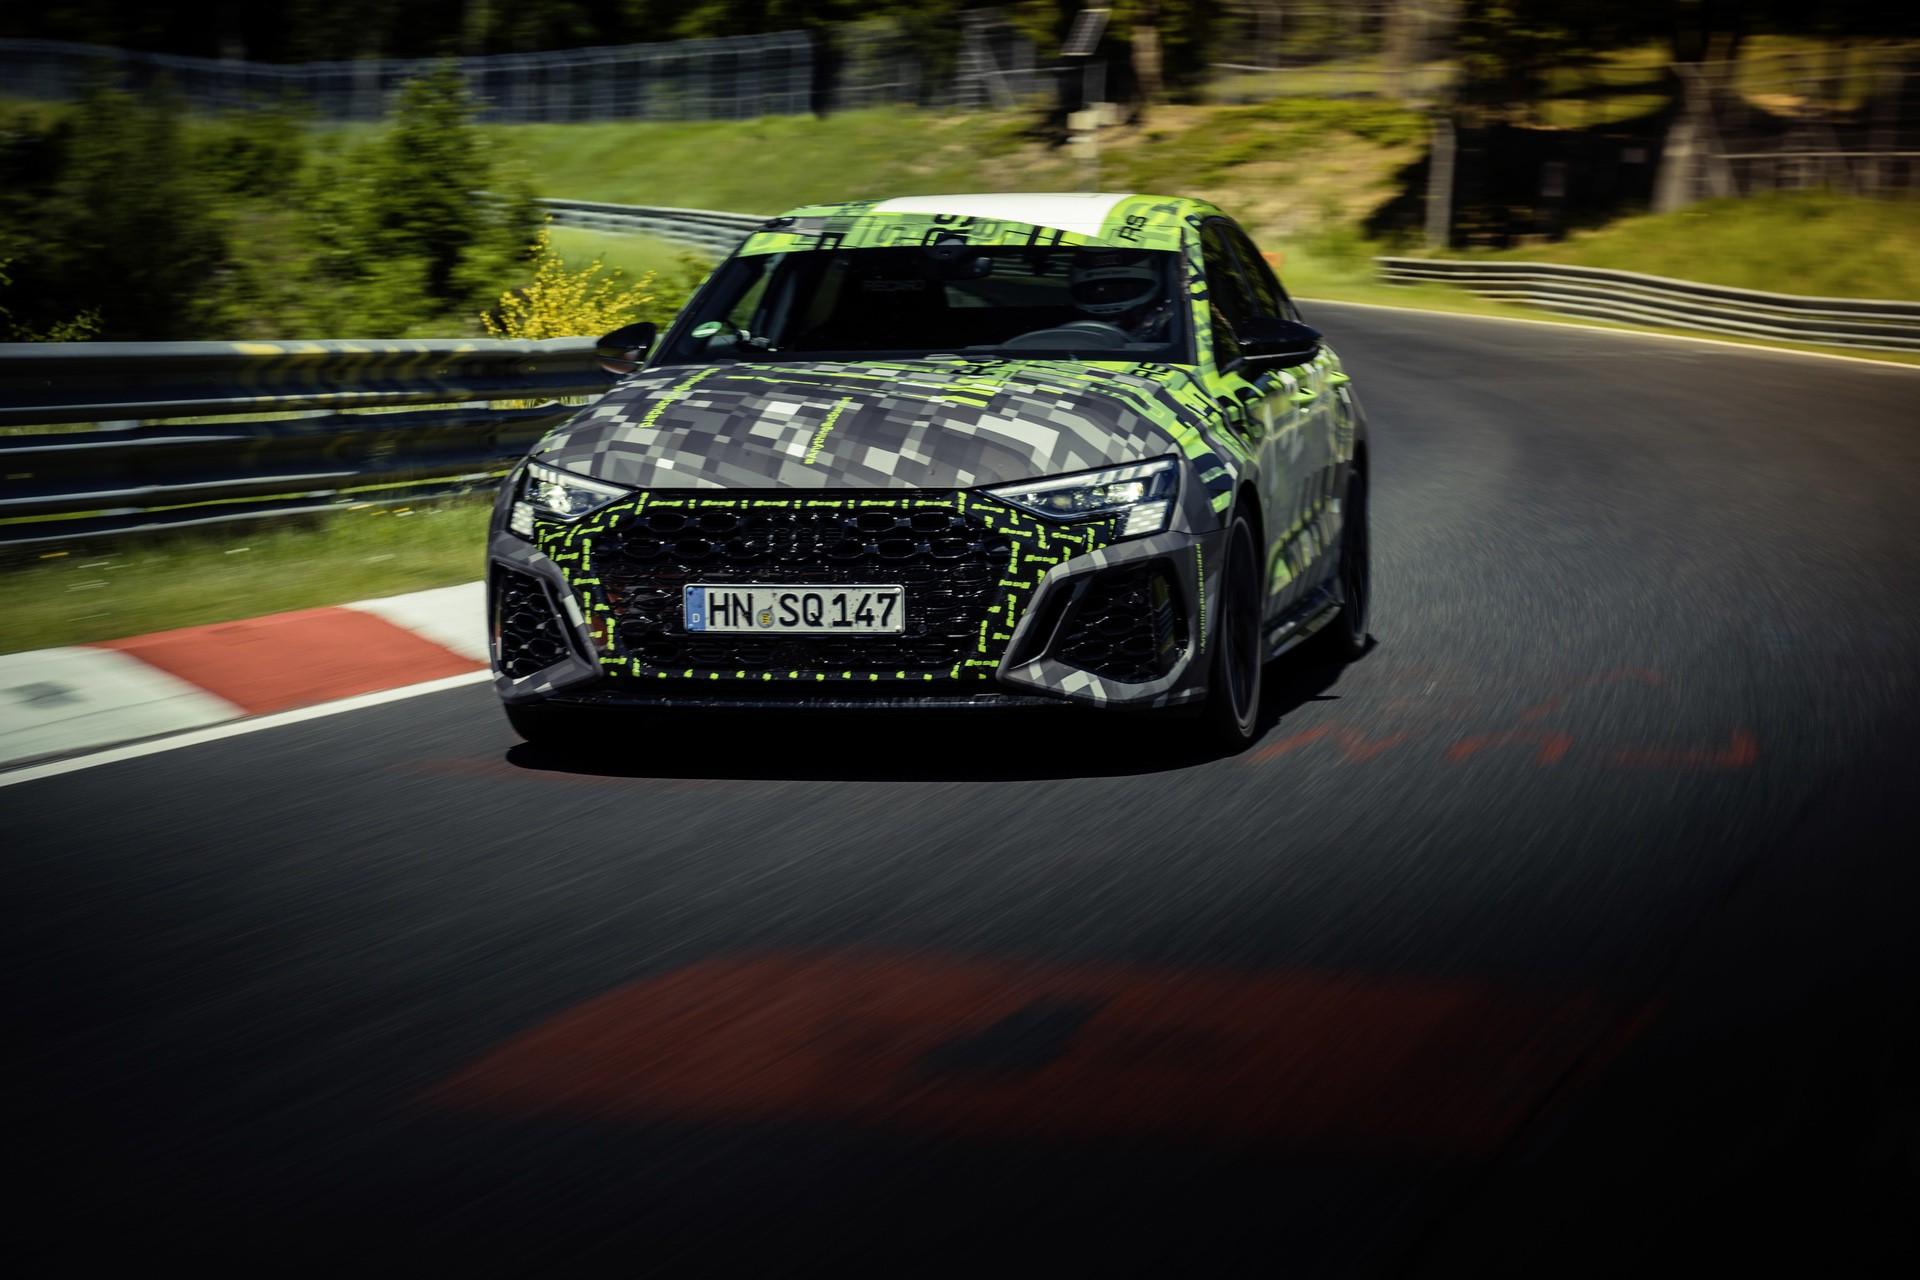 Audi_RS3_Sedan_Nurburgring_lap_record-0016